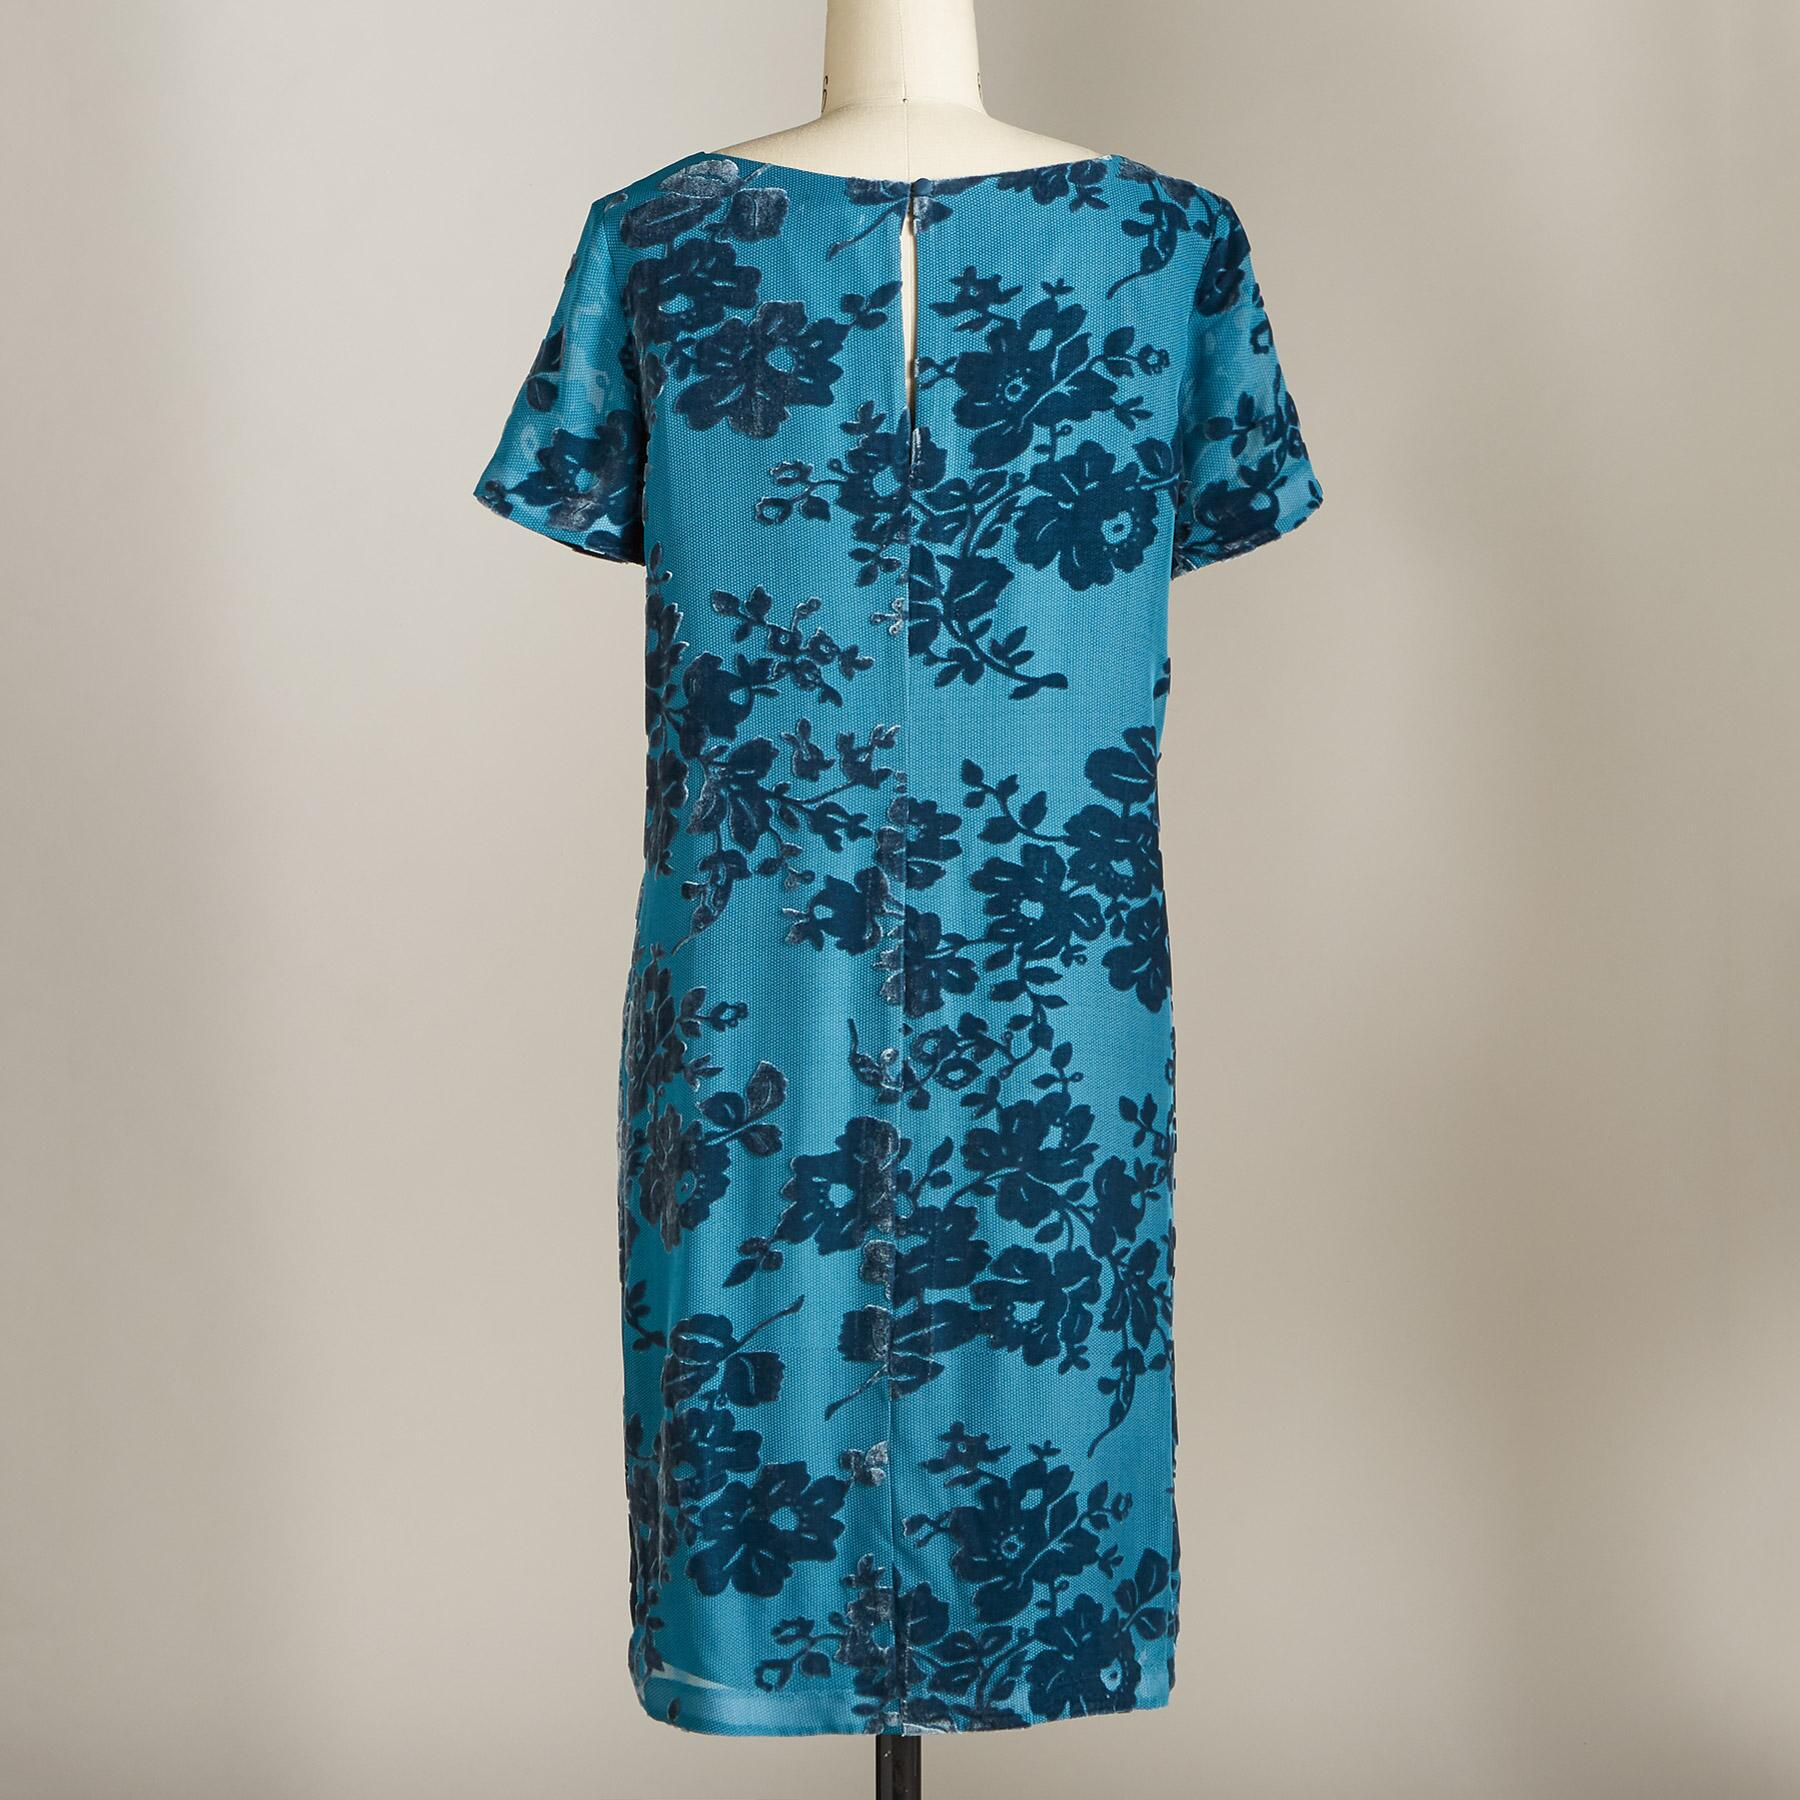 ELLA DRESS - PETITES: View 2